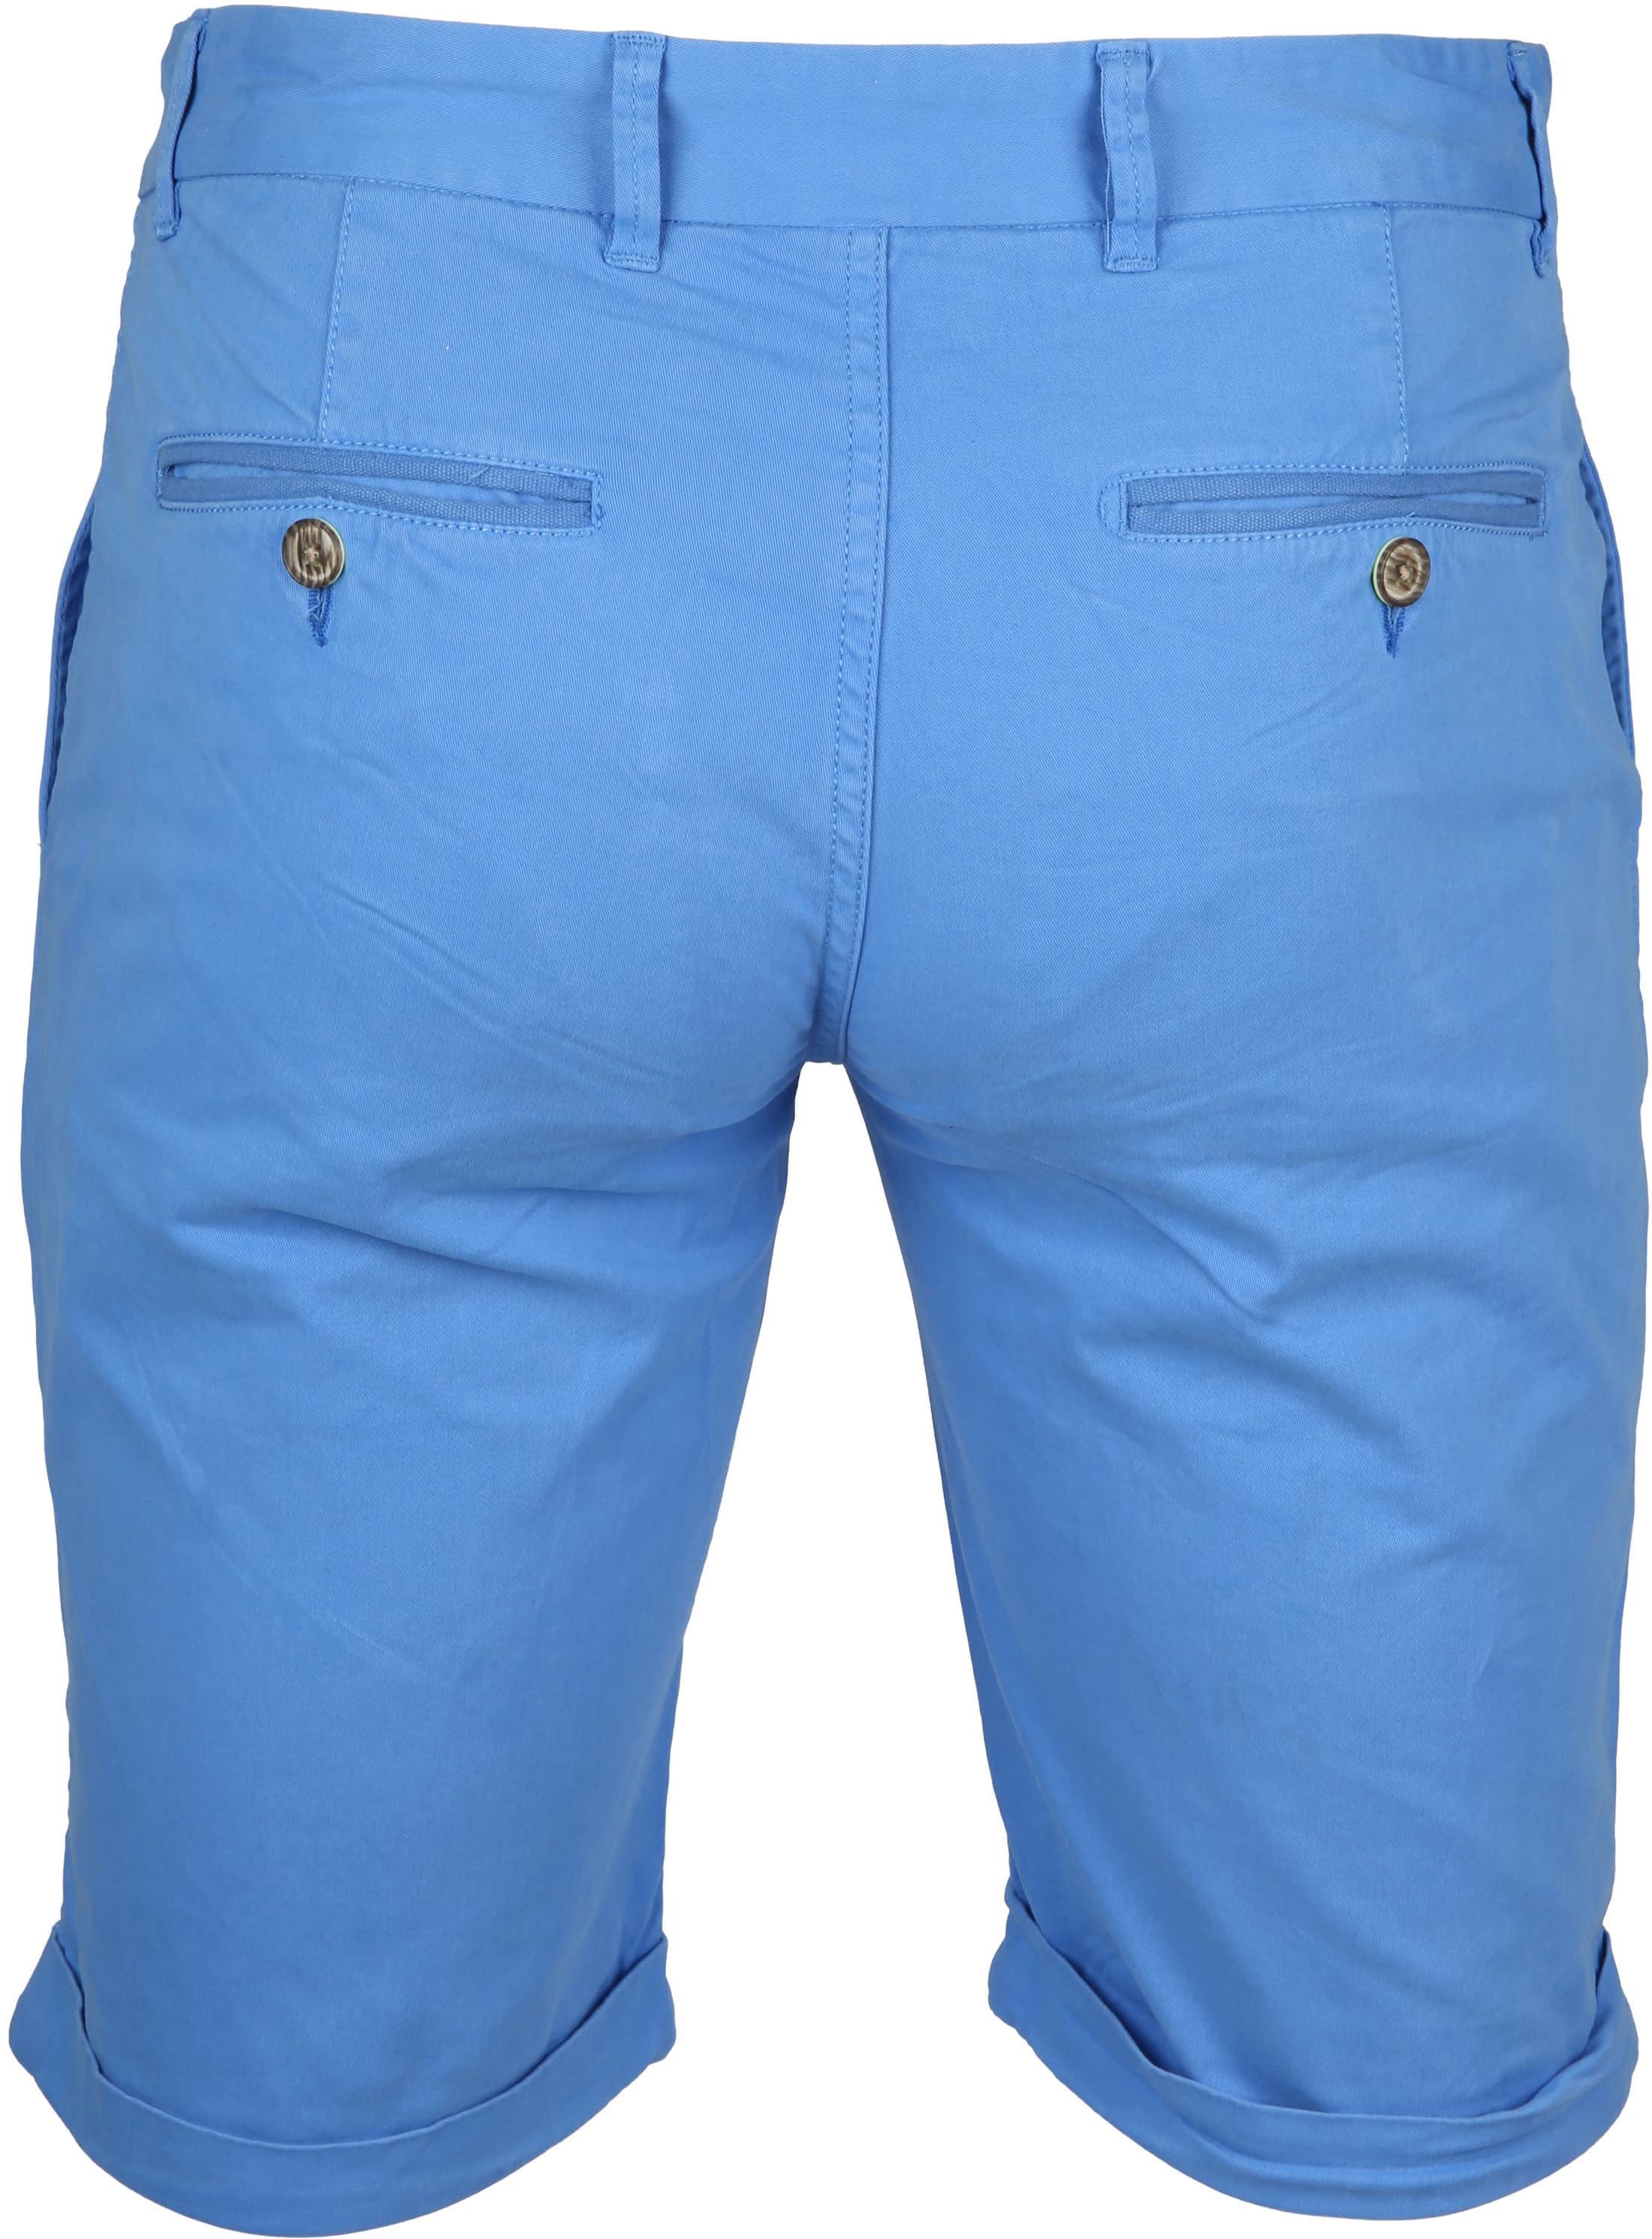 Suitable Short Arend Blauw foto 3